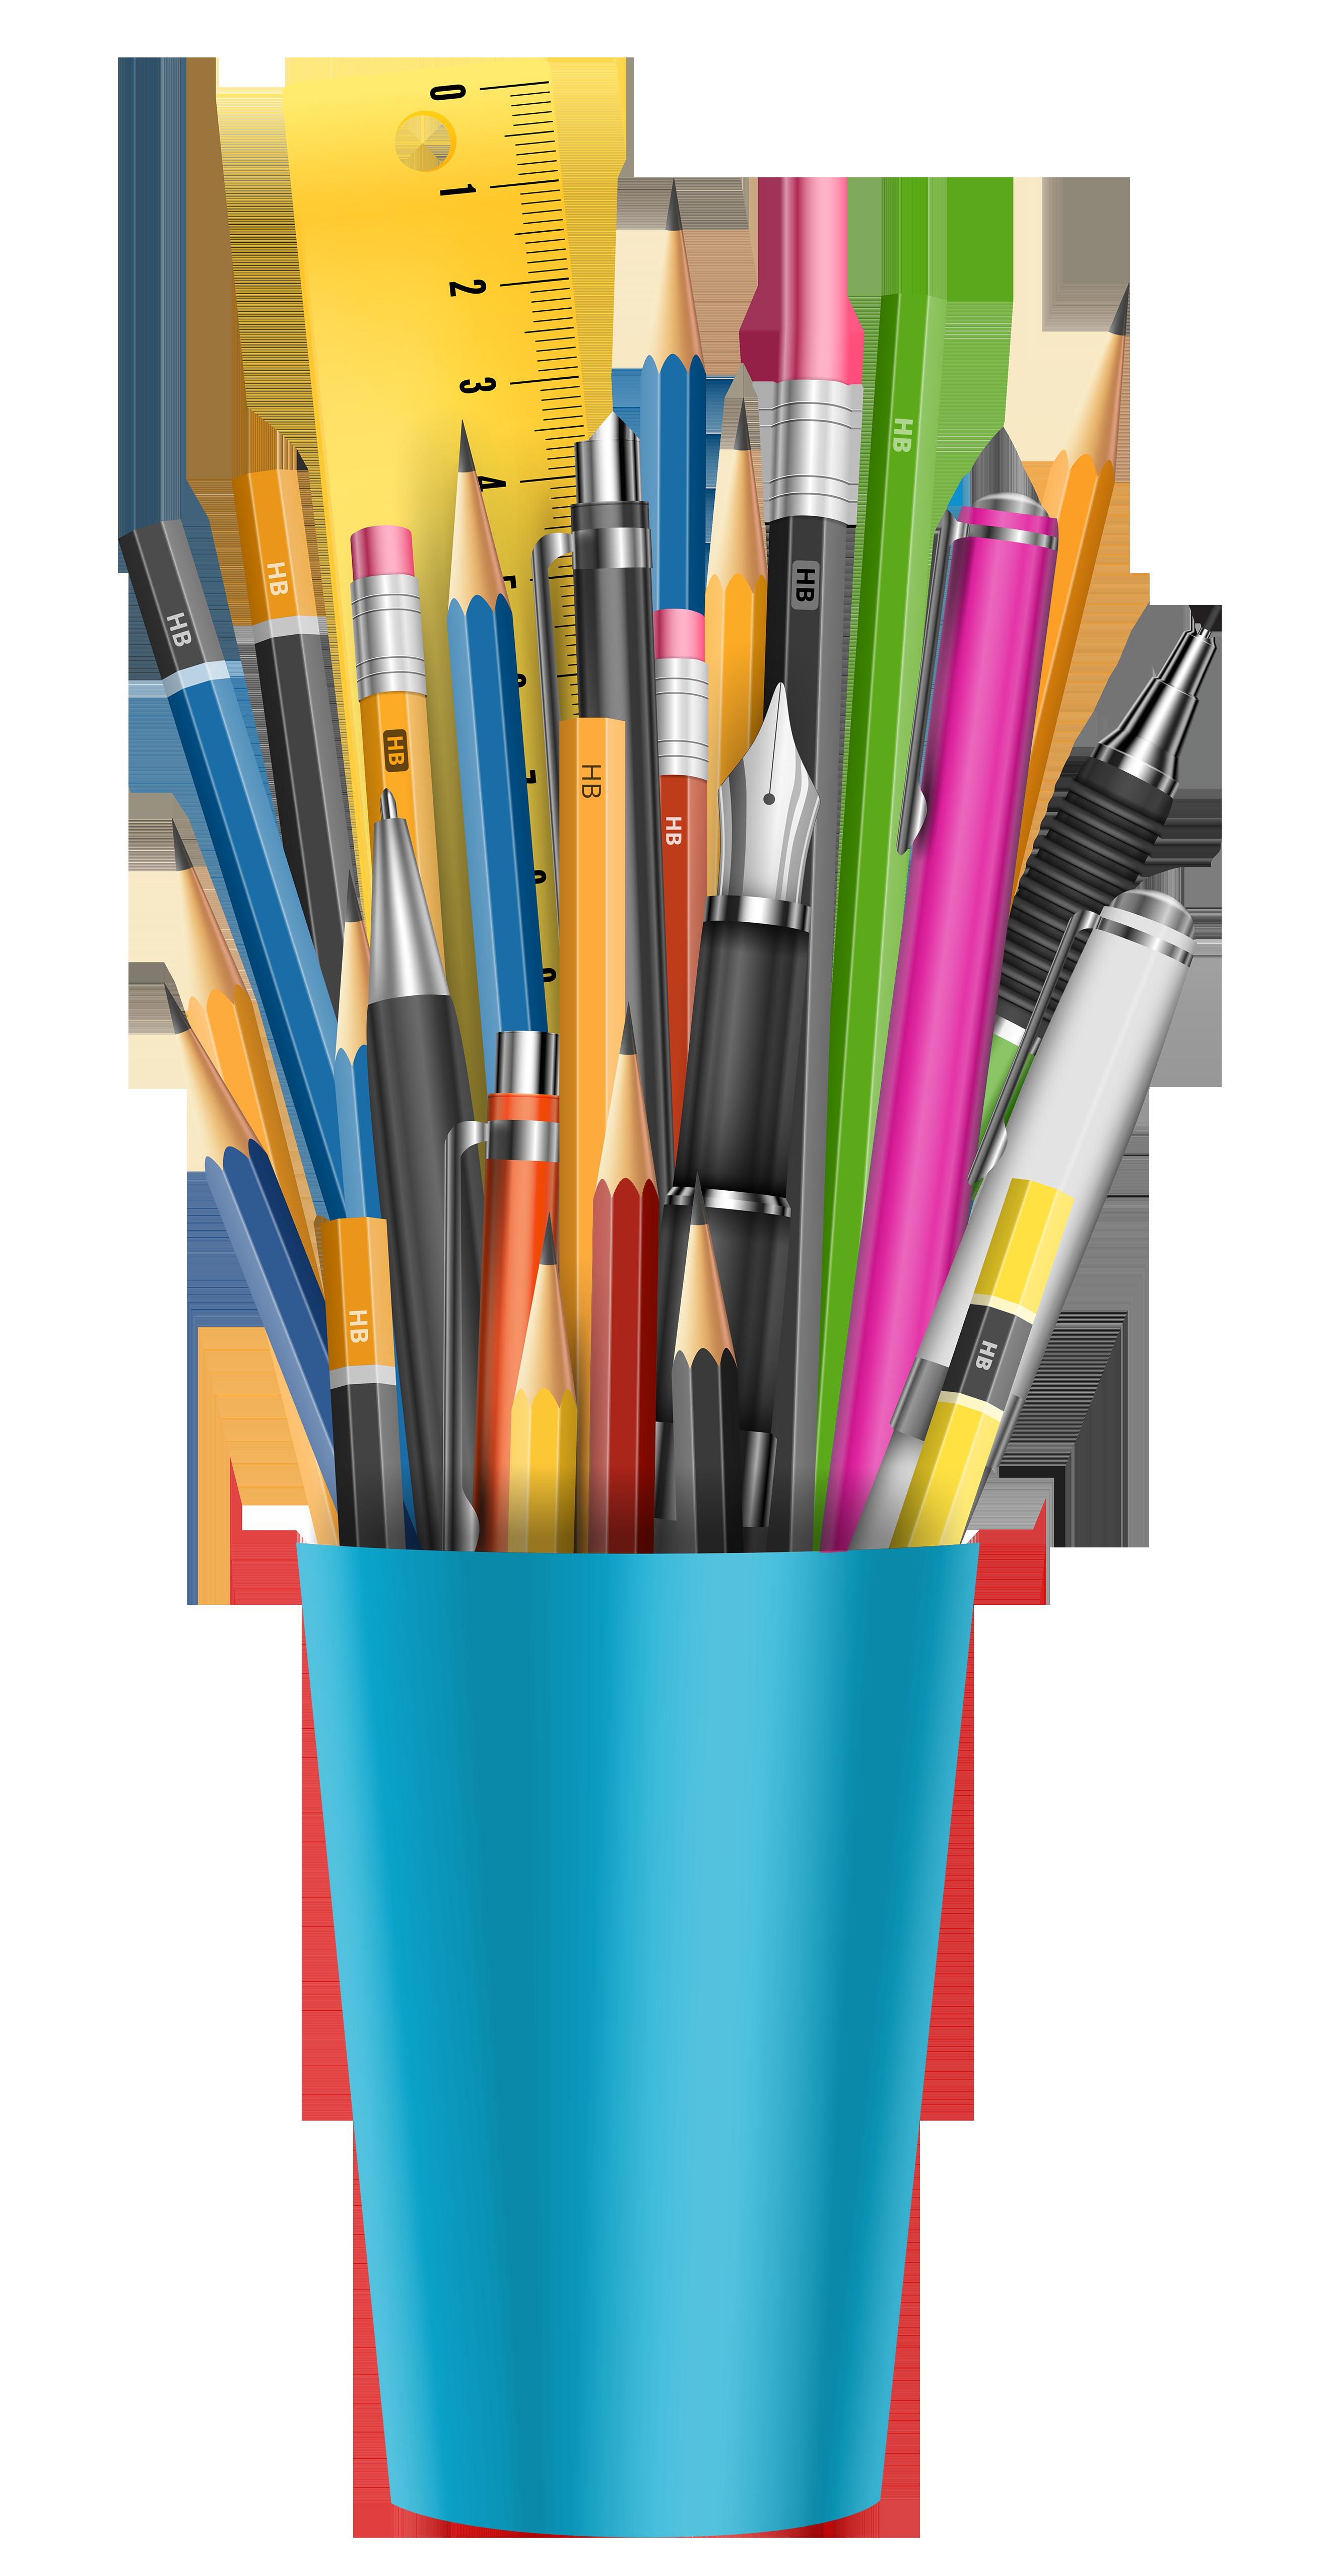 Pencil clipart label. Craft cup graphics illustrations